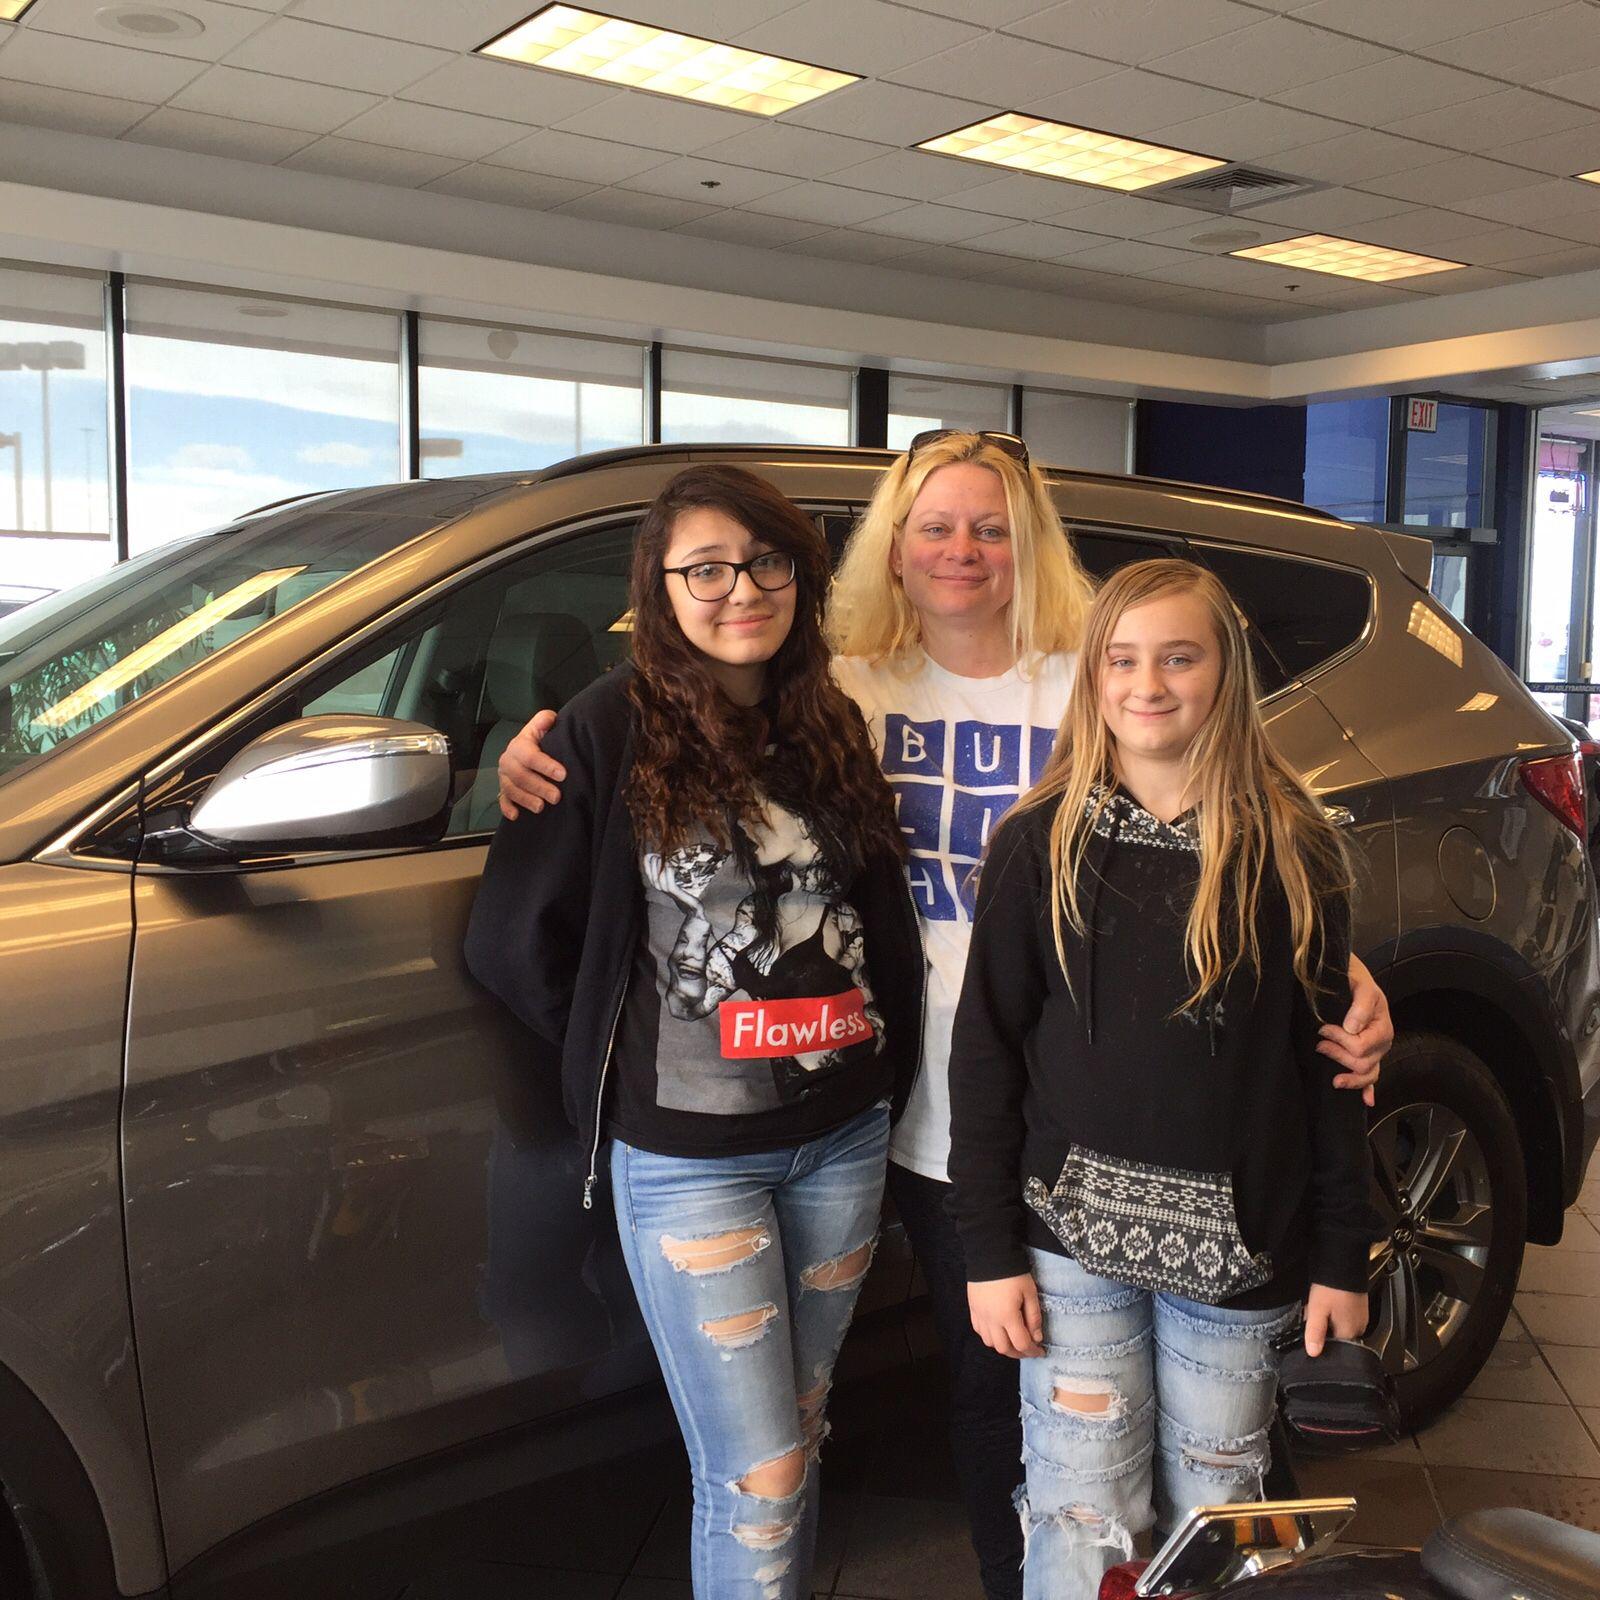 Congratulations Jennifer Overbay on your new 2016 Hyundai Santa Fe